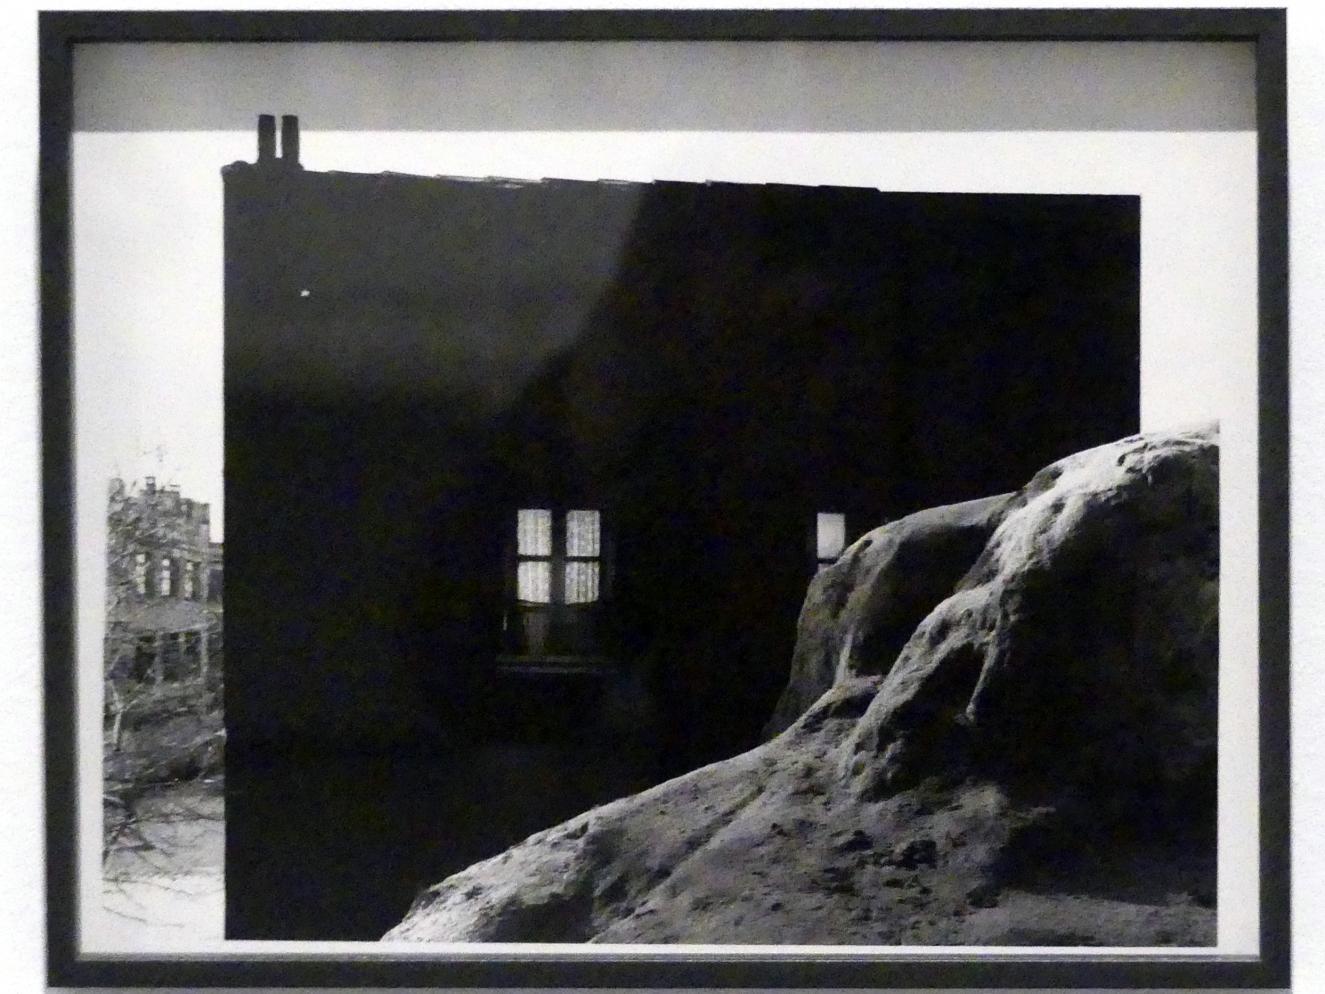 Francisco Gómez: Fassade schwarz bemalt, 1961